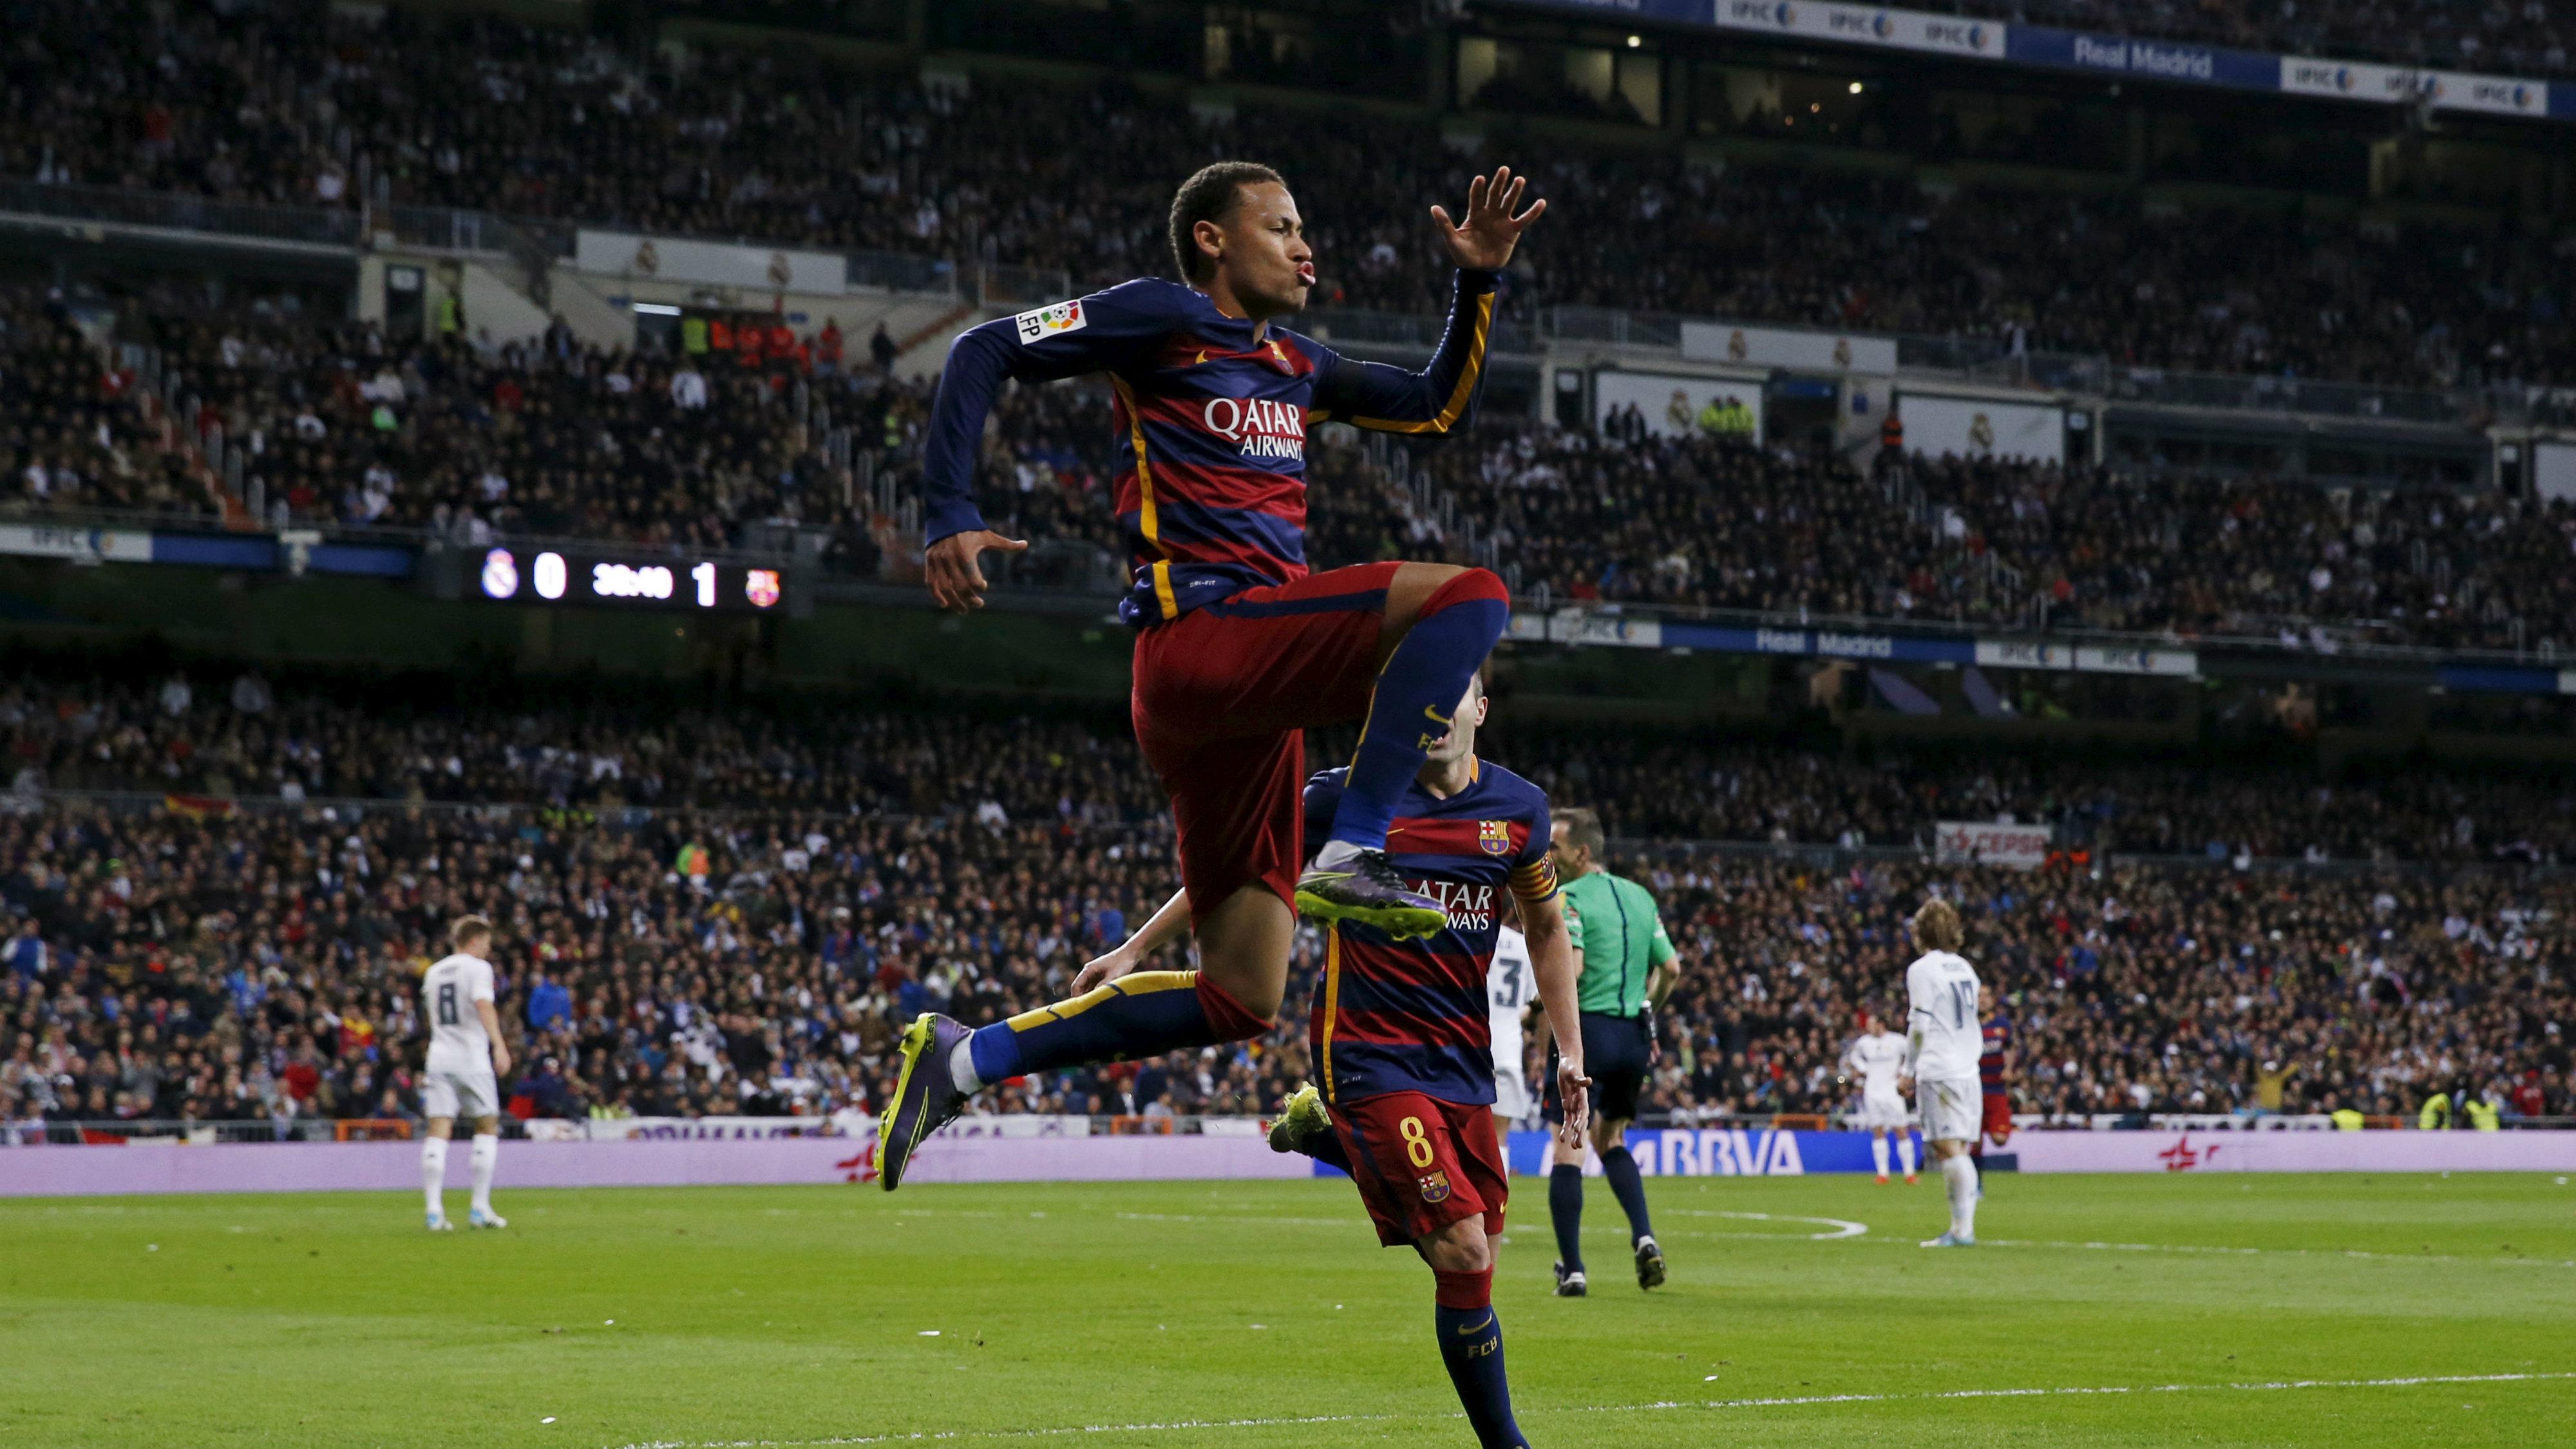 Neymar celebrates after scoring the second goal for Barcelona